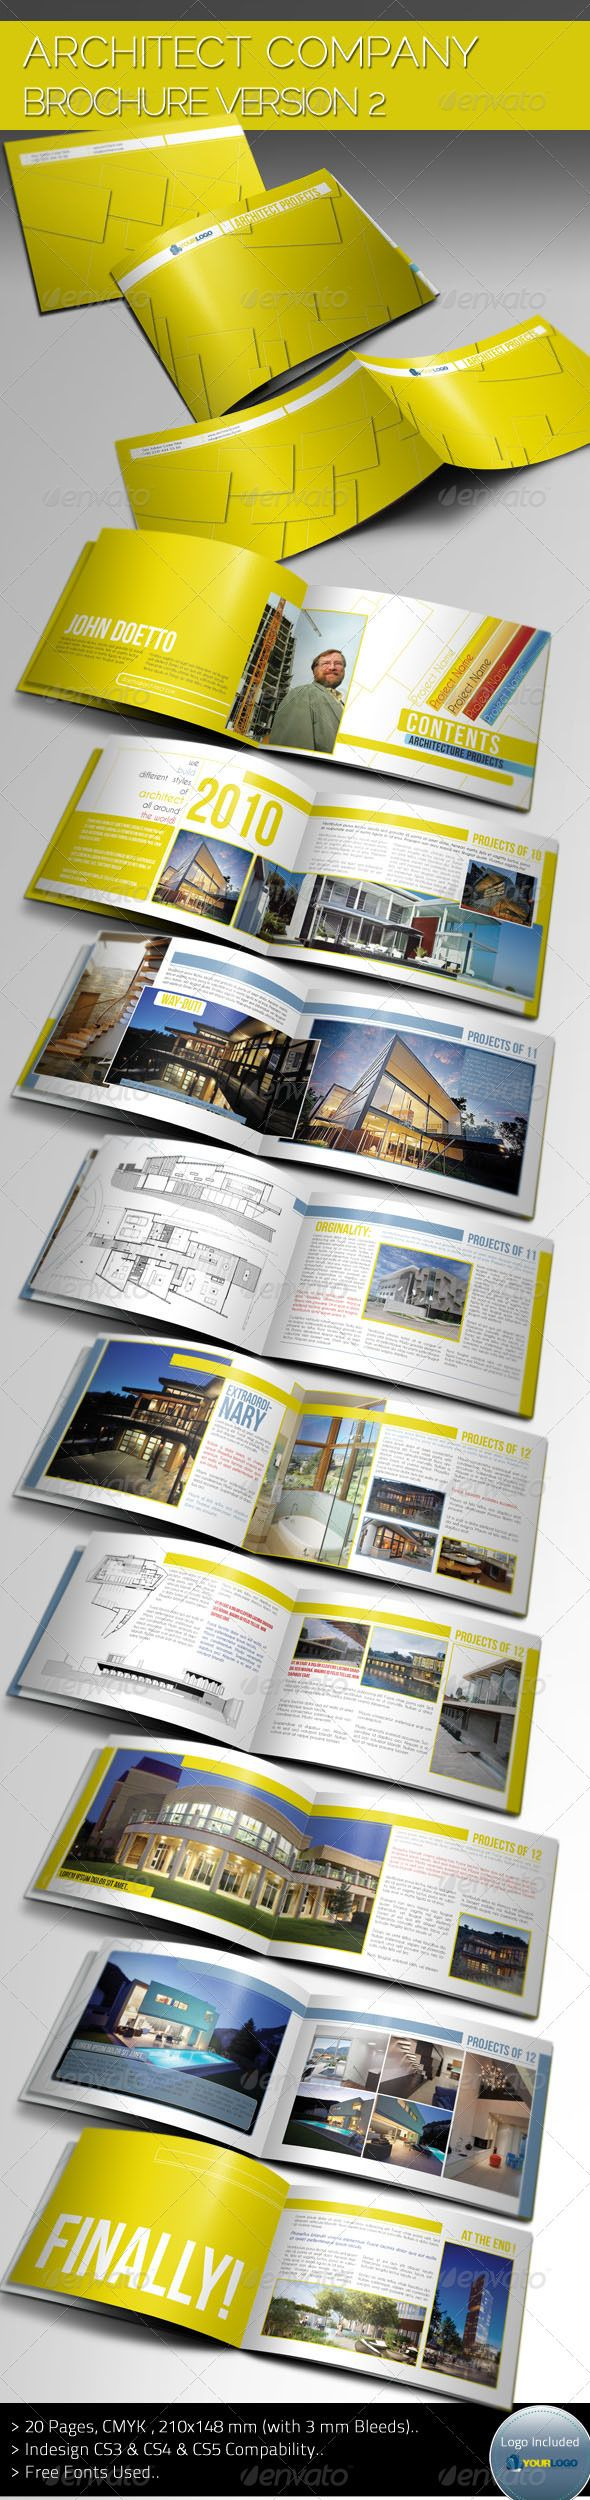 Architecture Brochure Template Ver.II